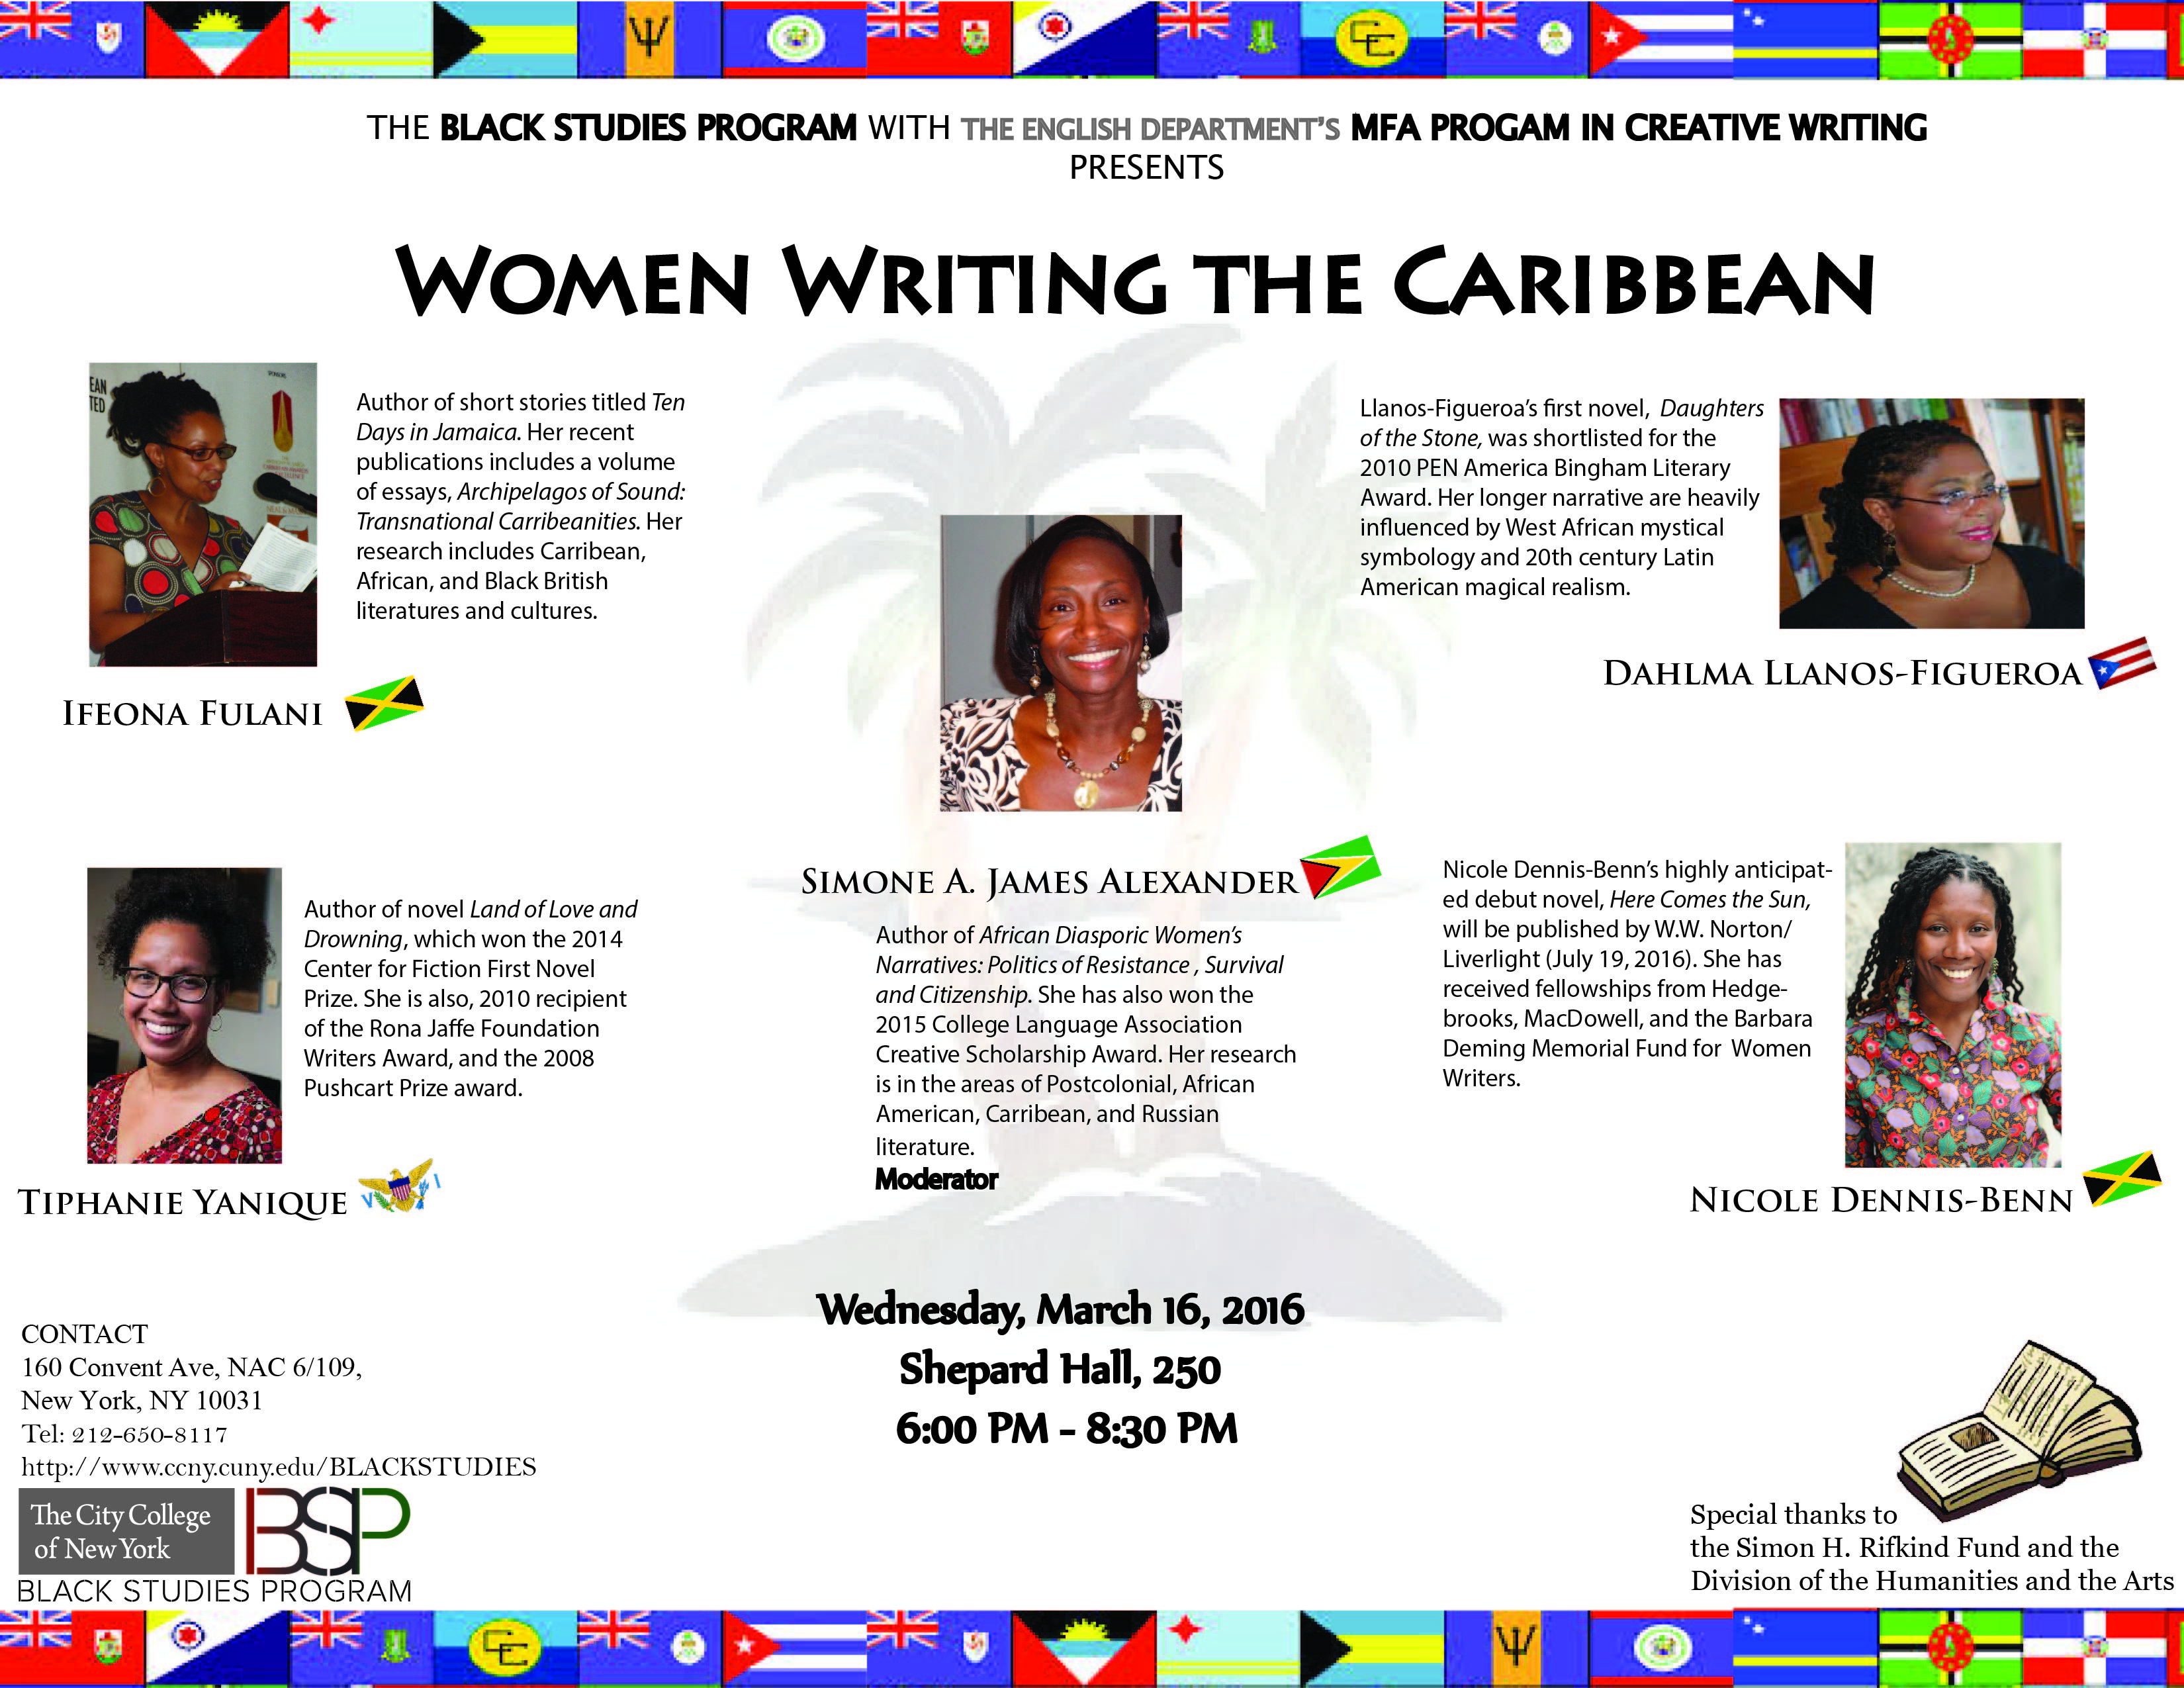 Women Writing the Caribbean